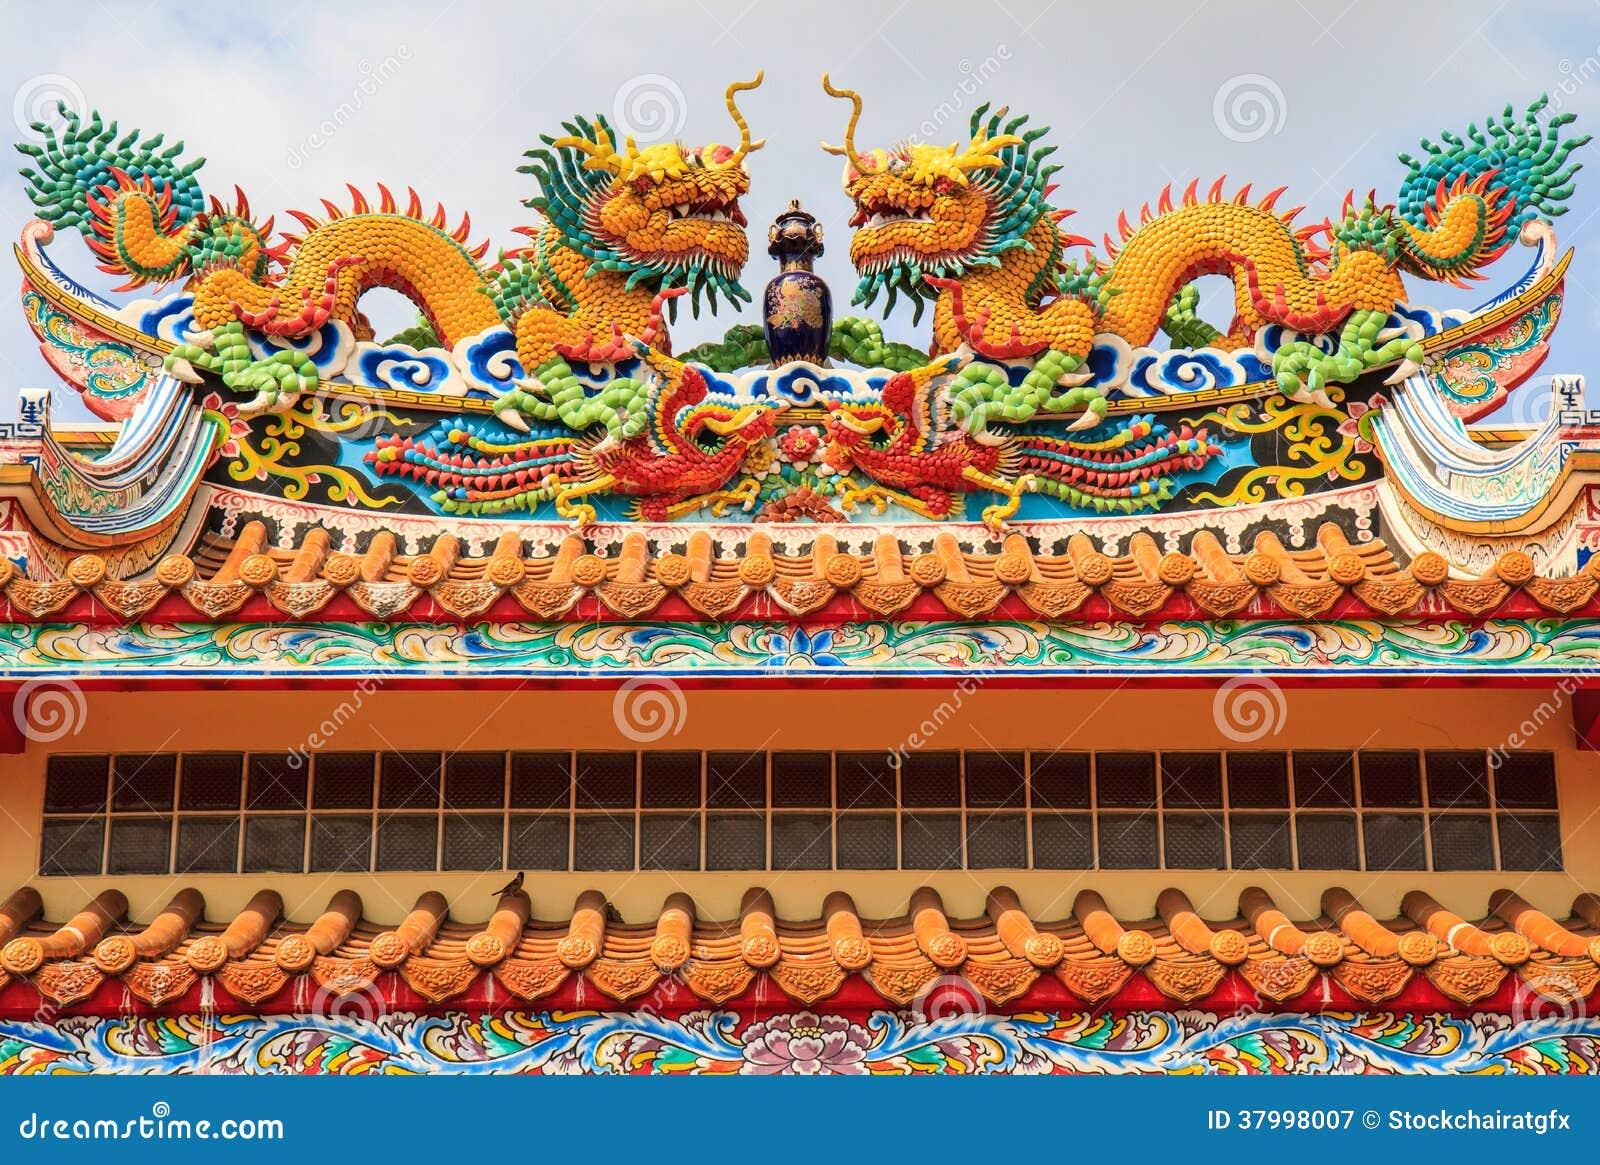 Colourful dragon